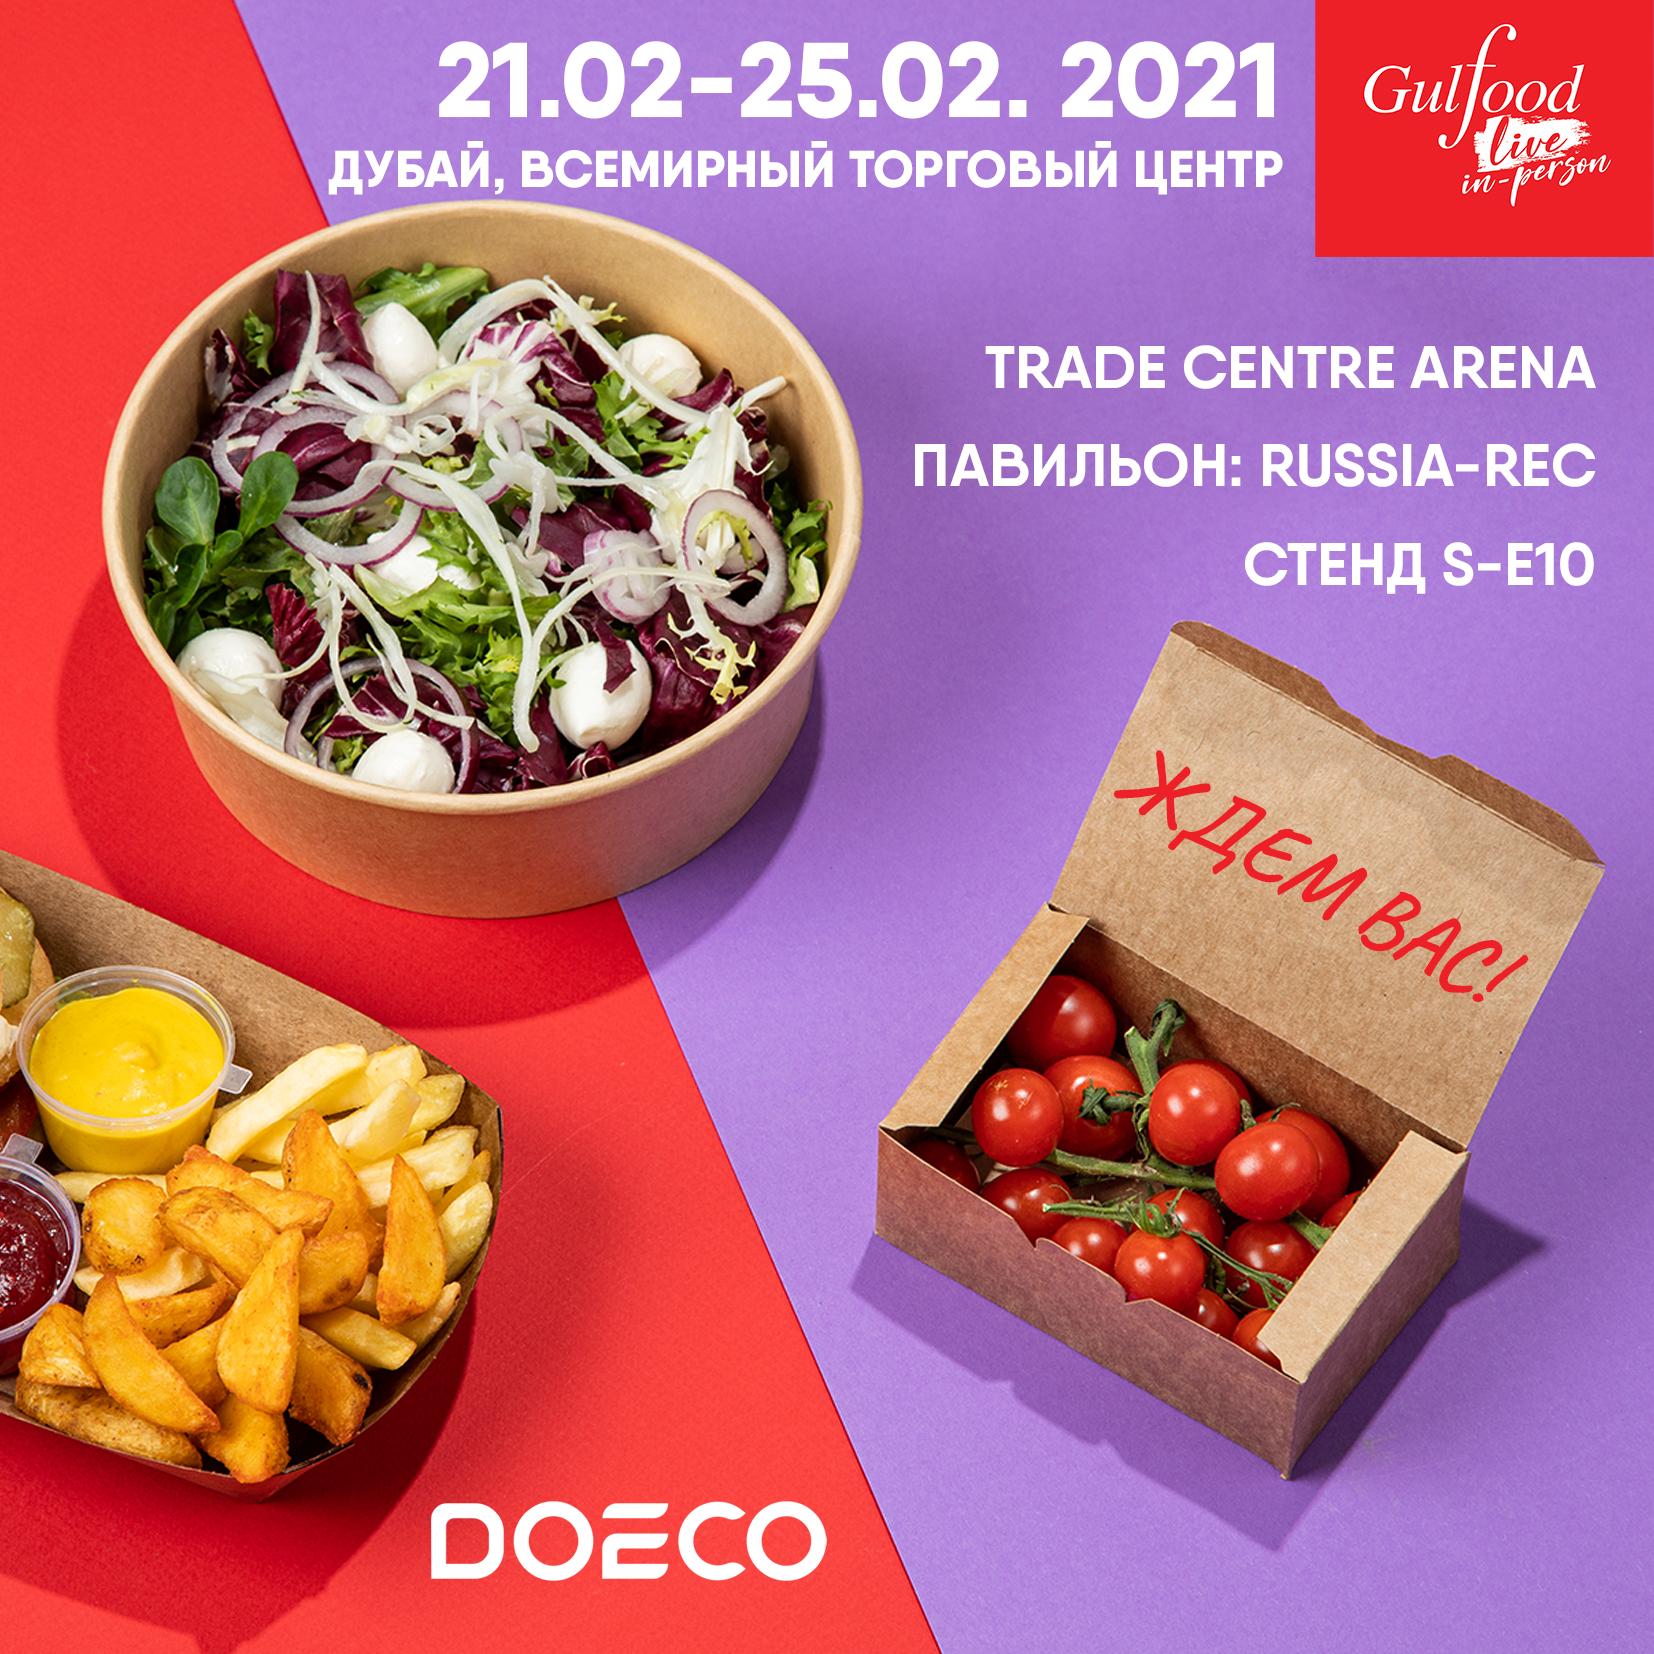 dubai рус - Doeco на Gulfood 2021 в Дубае